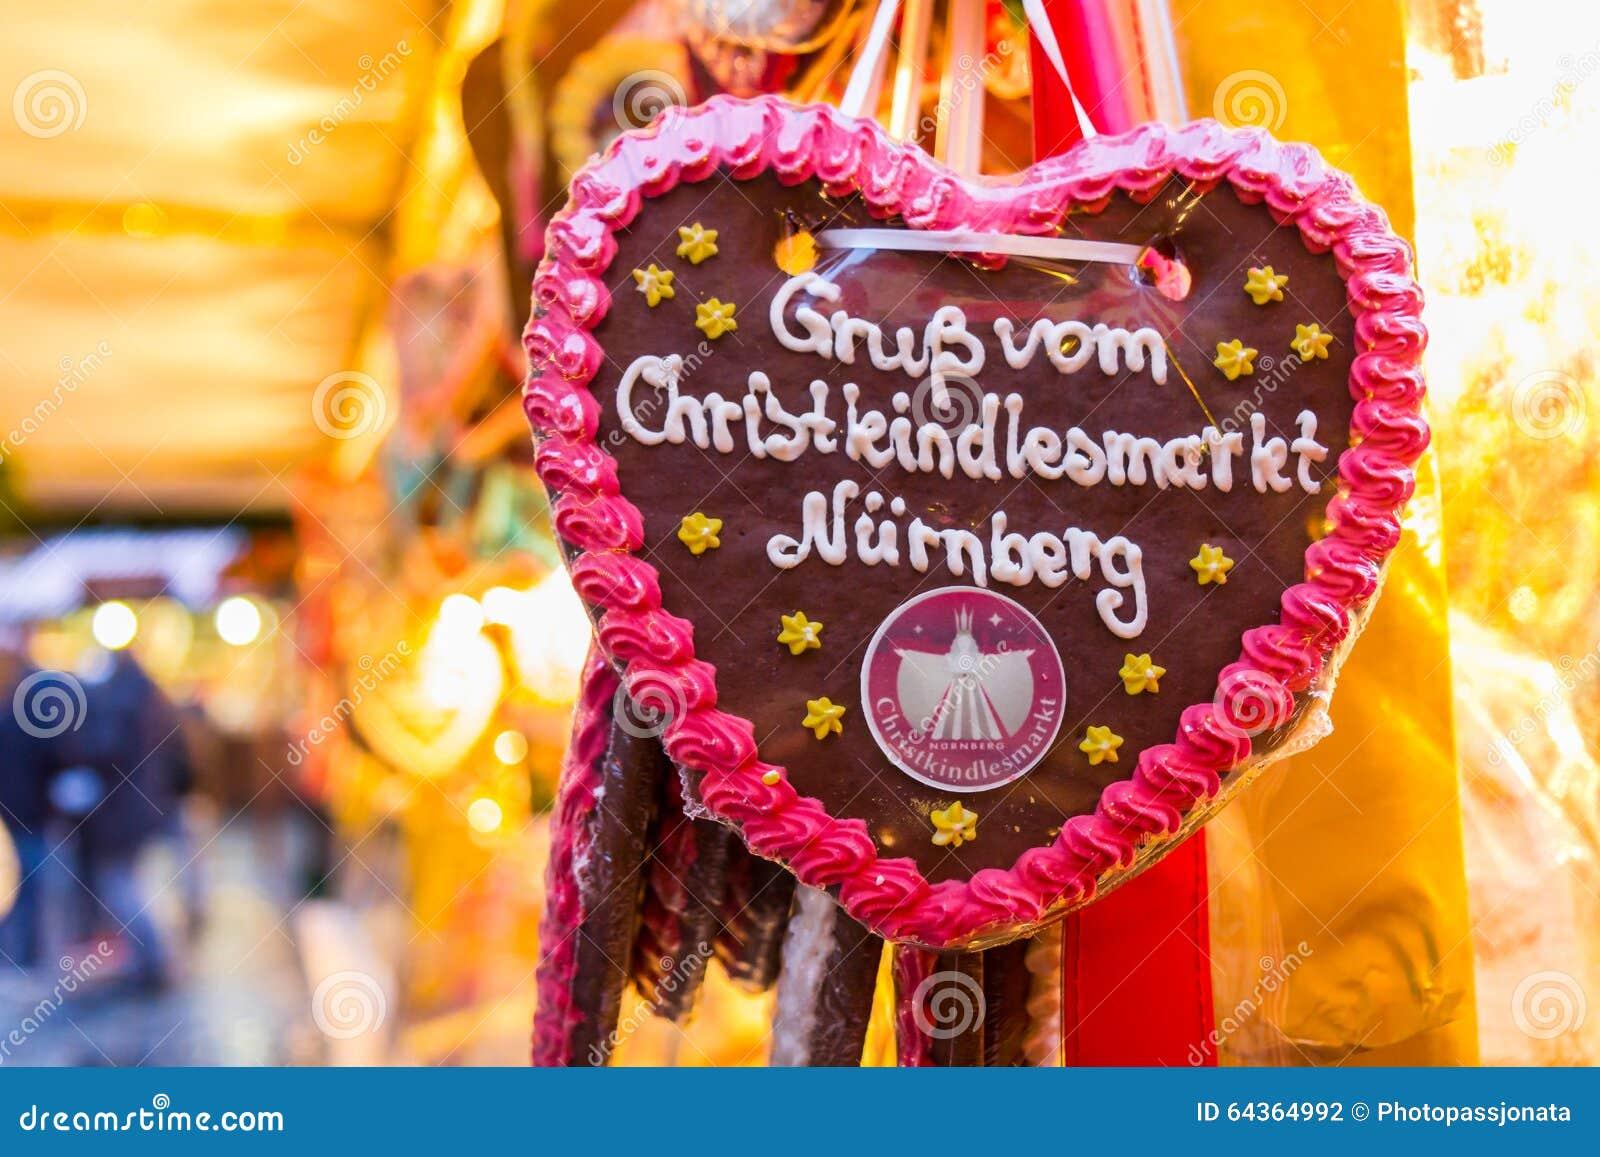 Greetings from Christmas Market-gingerbread heart- Nuremberg-Germany